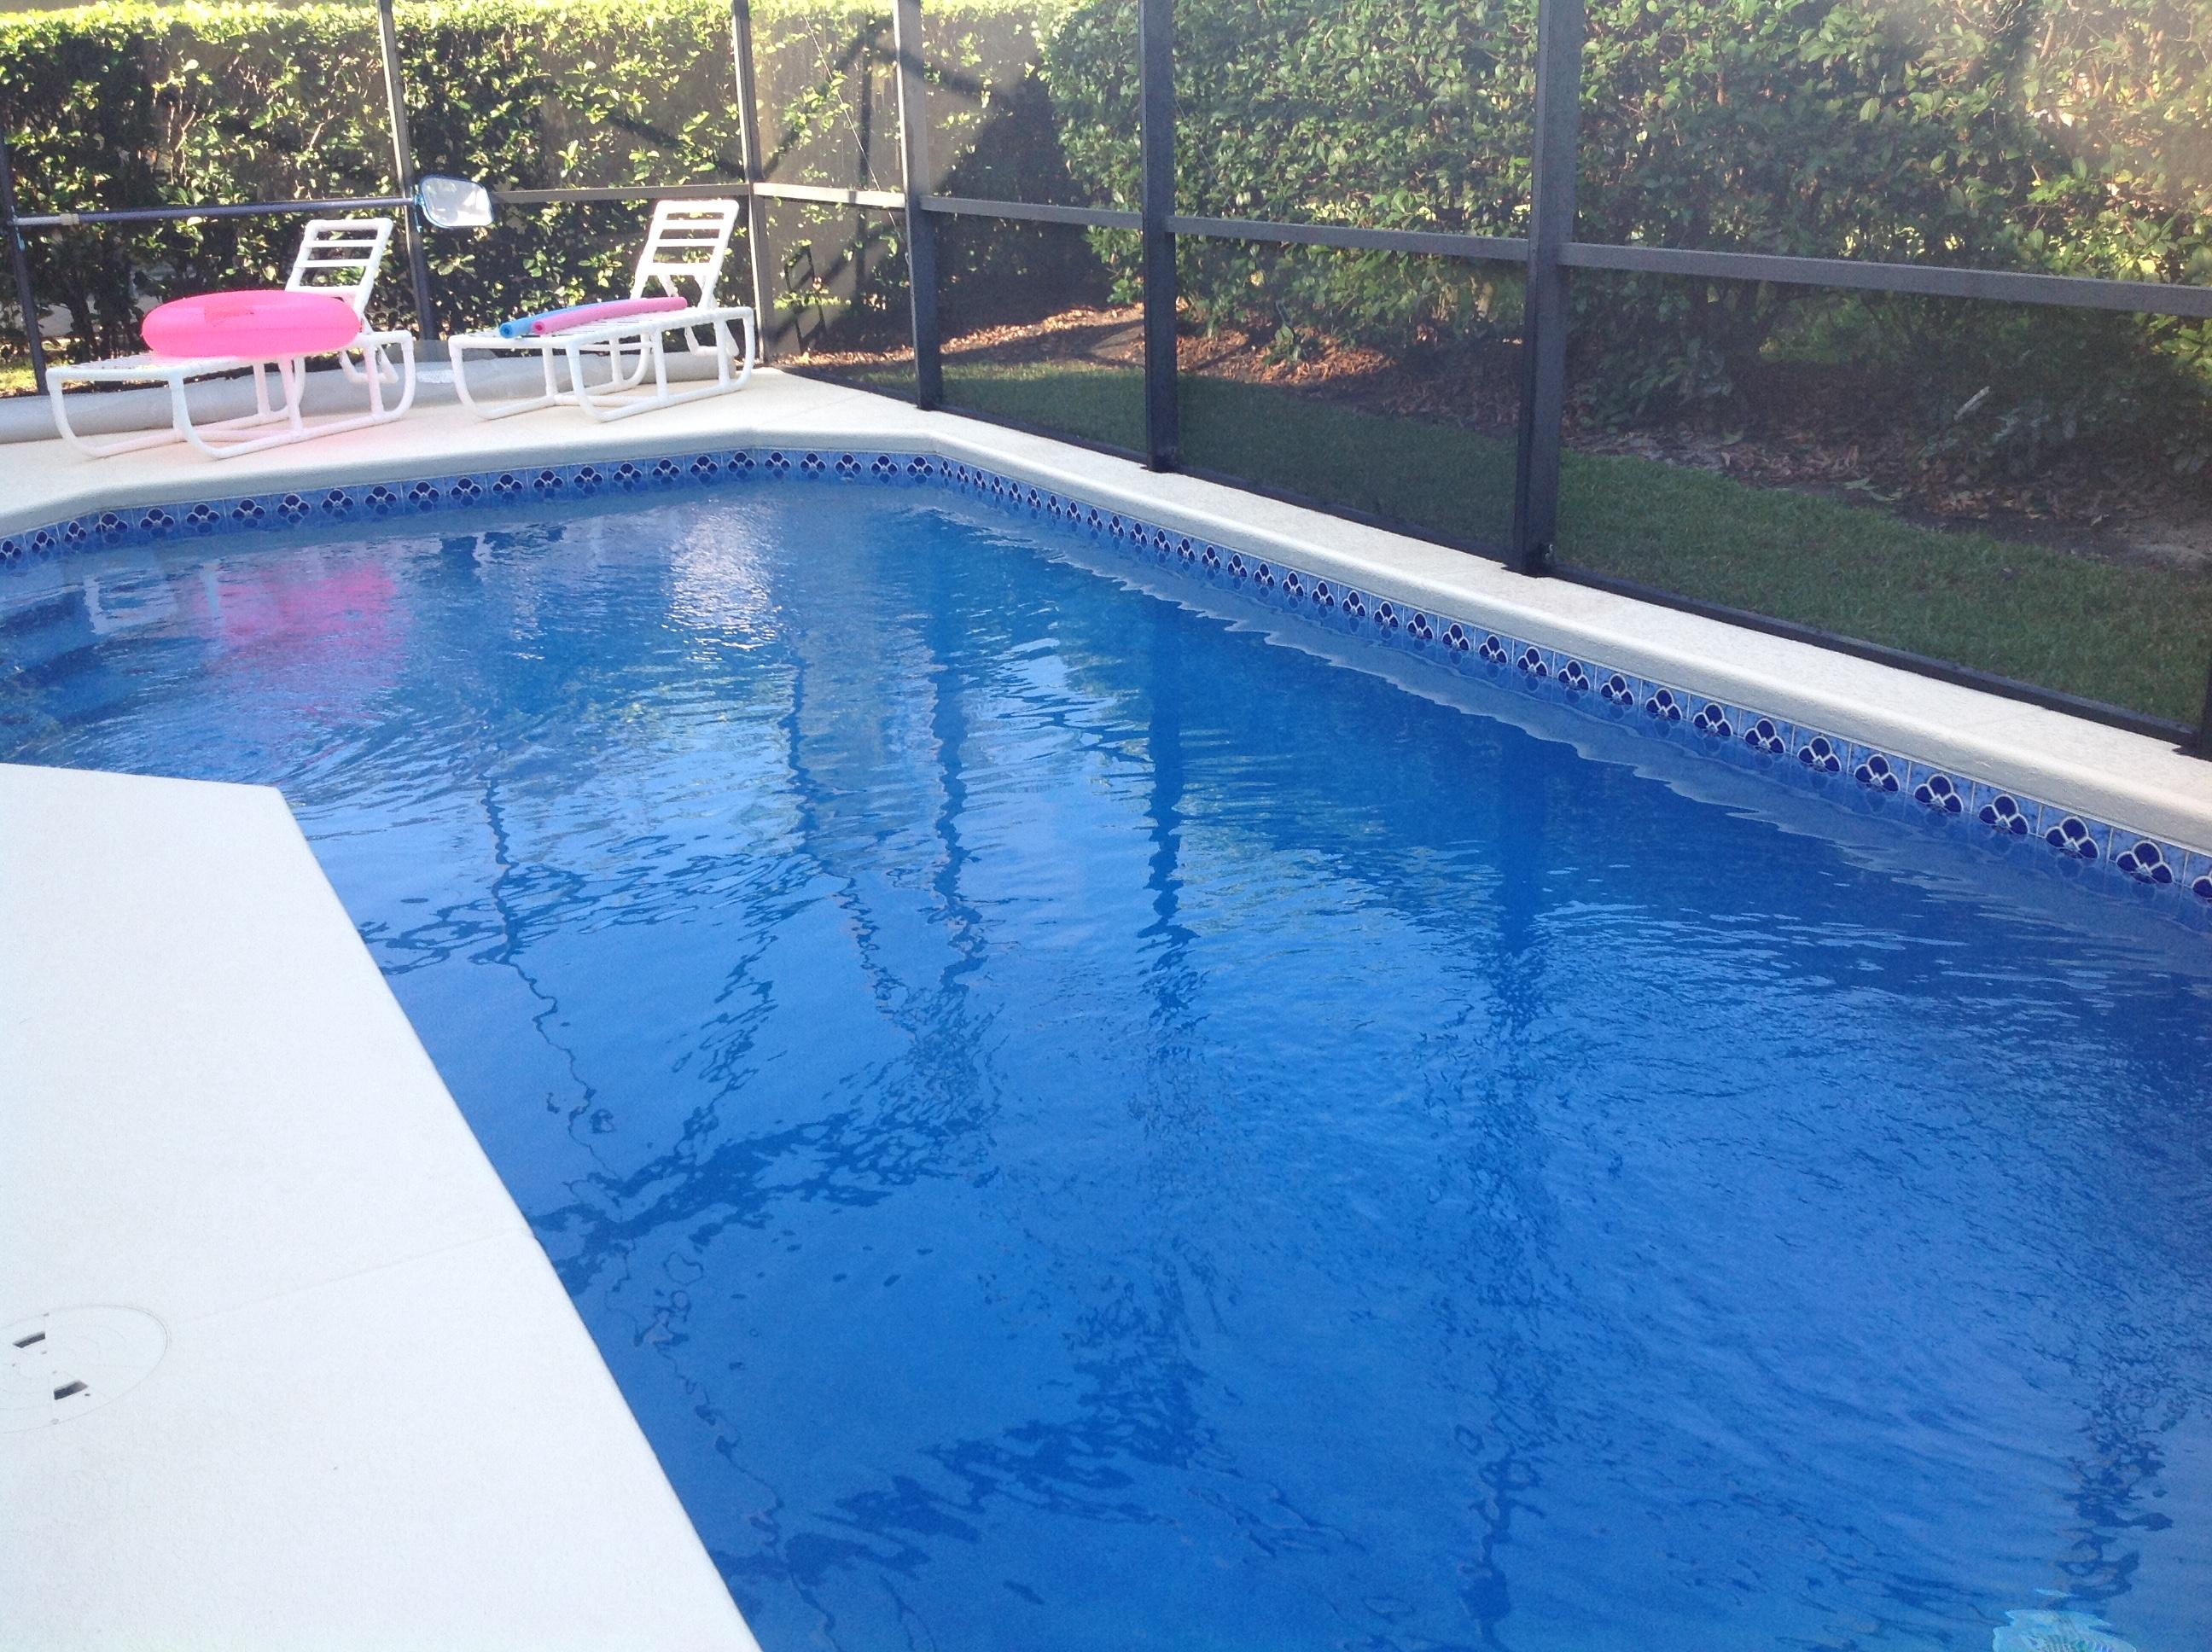 Lot 16 - 1 week house rental in Florida sleeps 8 - Kokomo Loop Executive Villa on Southern Dunes Golf and